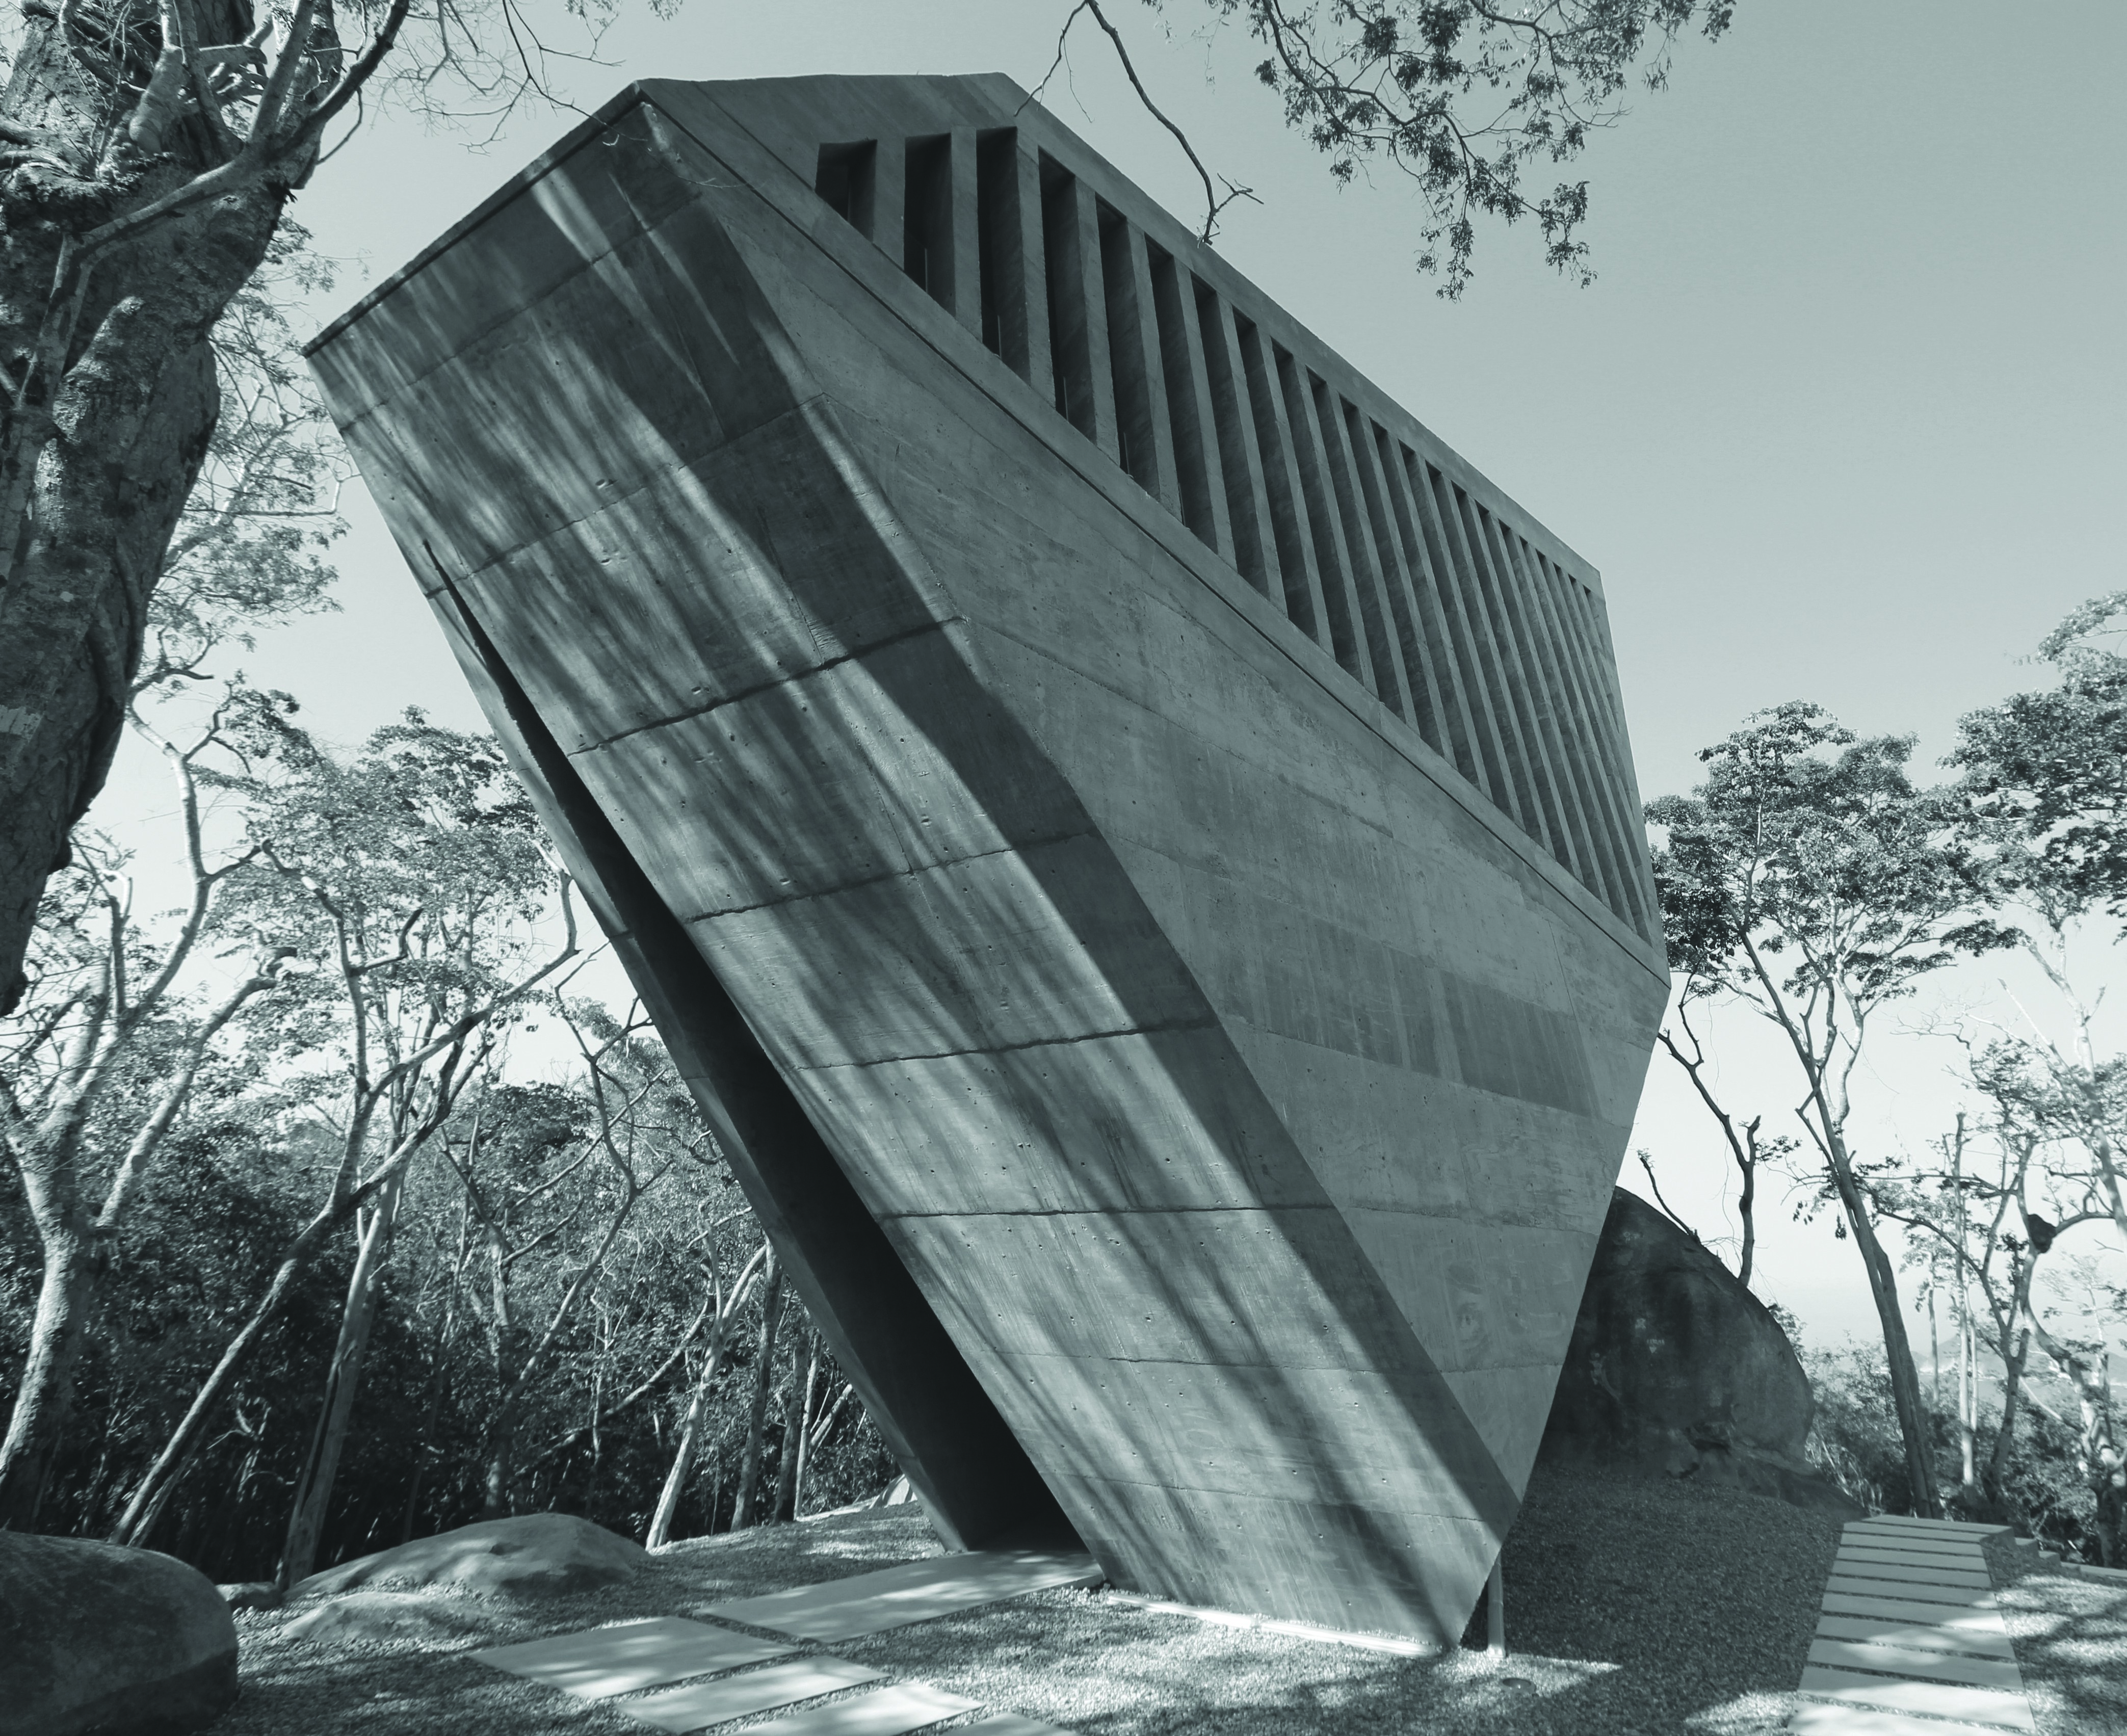 Naplemente Kápolna, Acapulco, Mexikó (Bunker Arquitectura, 2011)